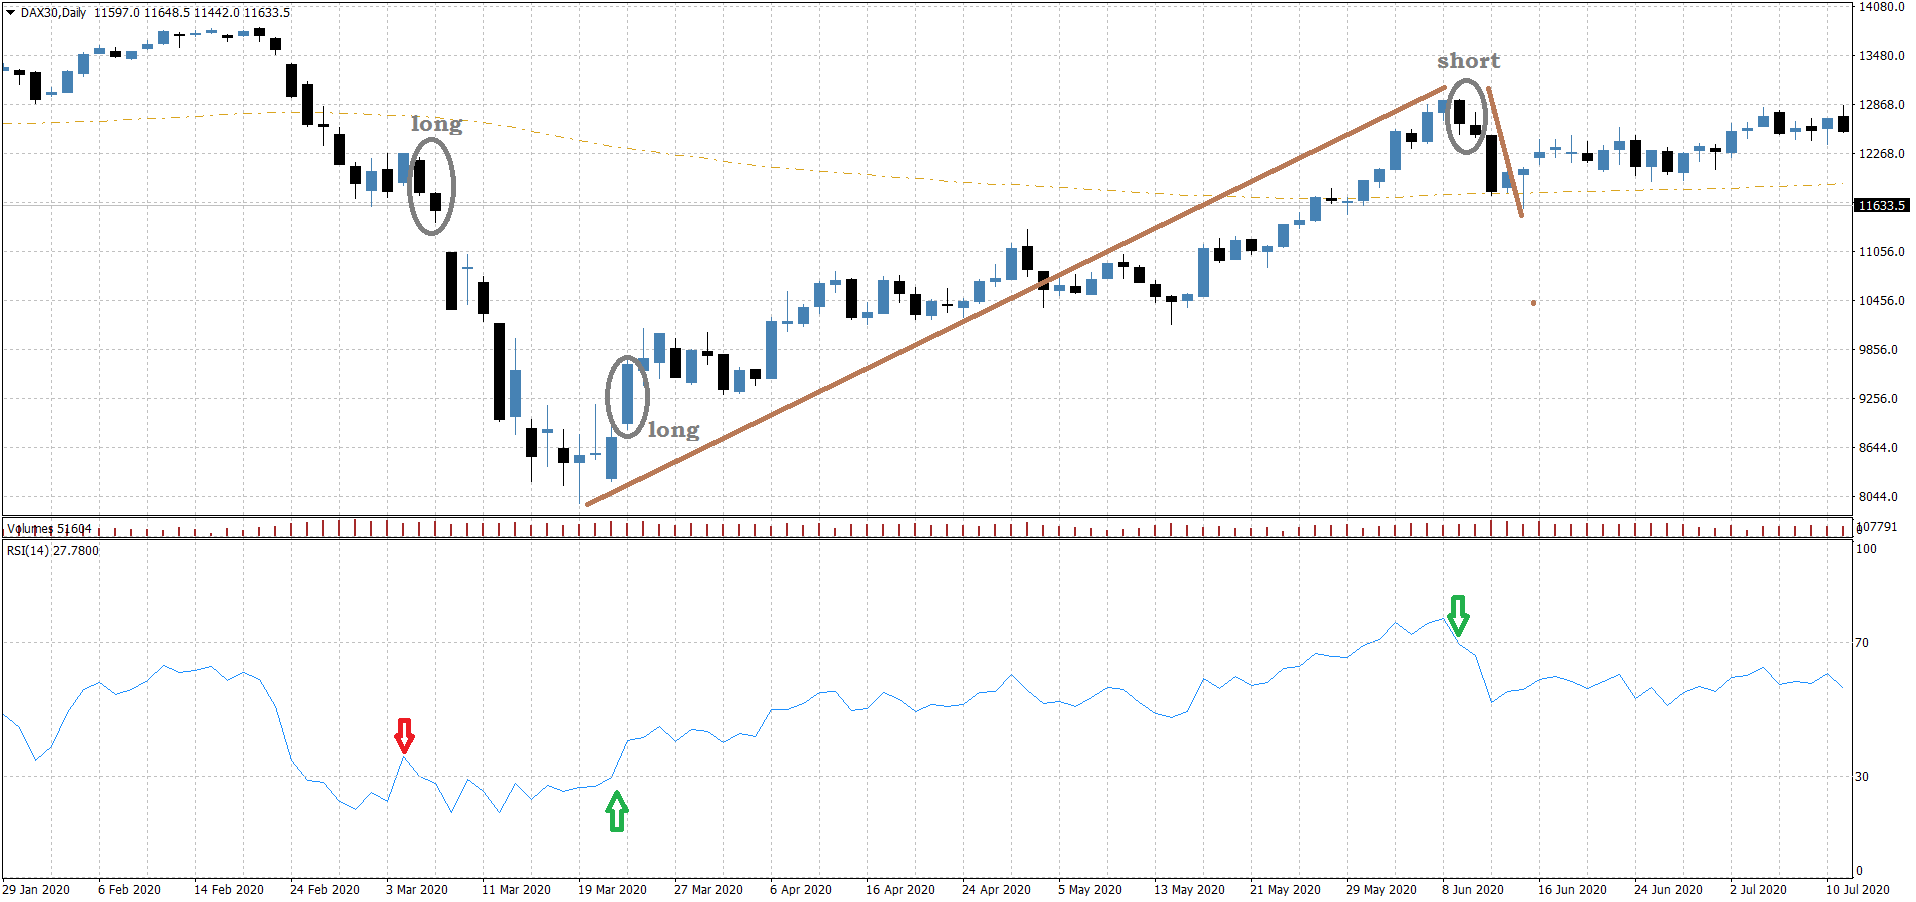 Swingtrading Indikatoren Chartbeispiel RSI mit Fehlsignal